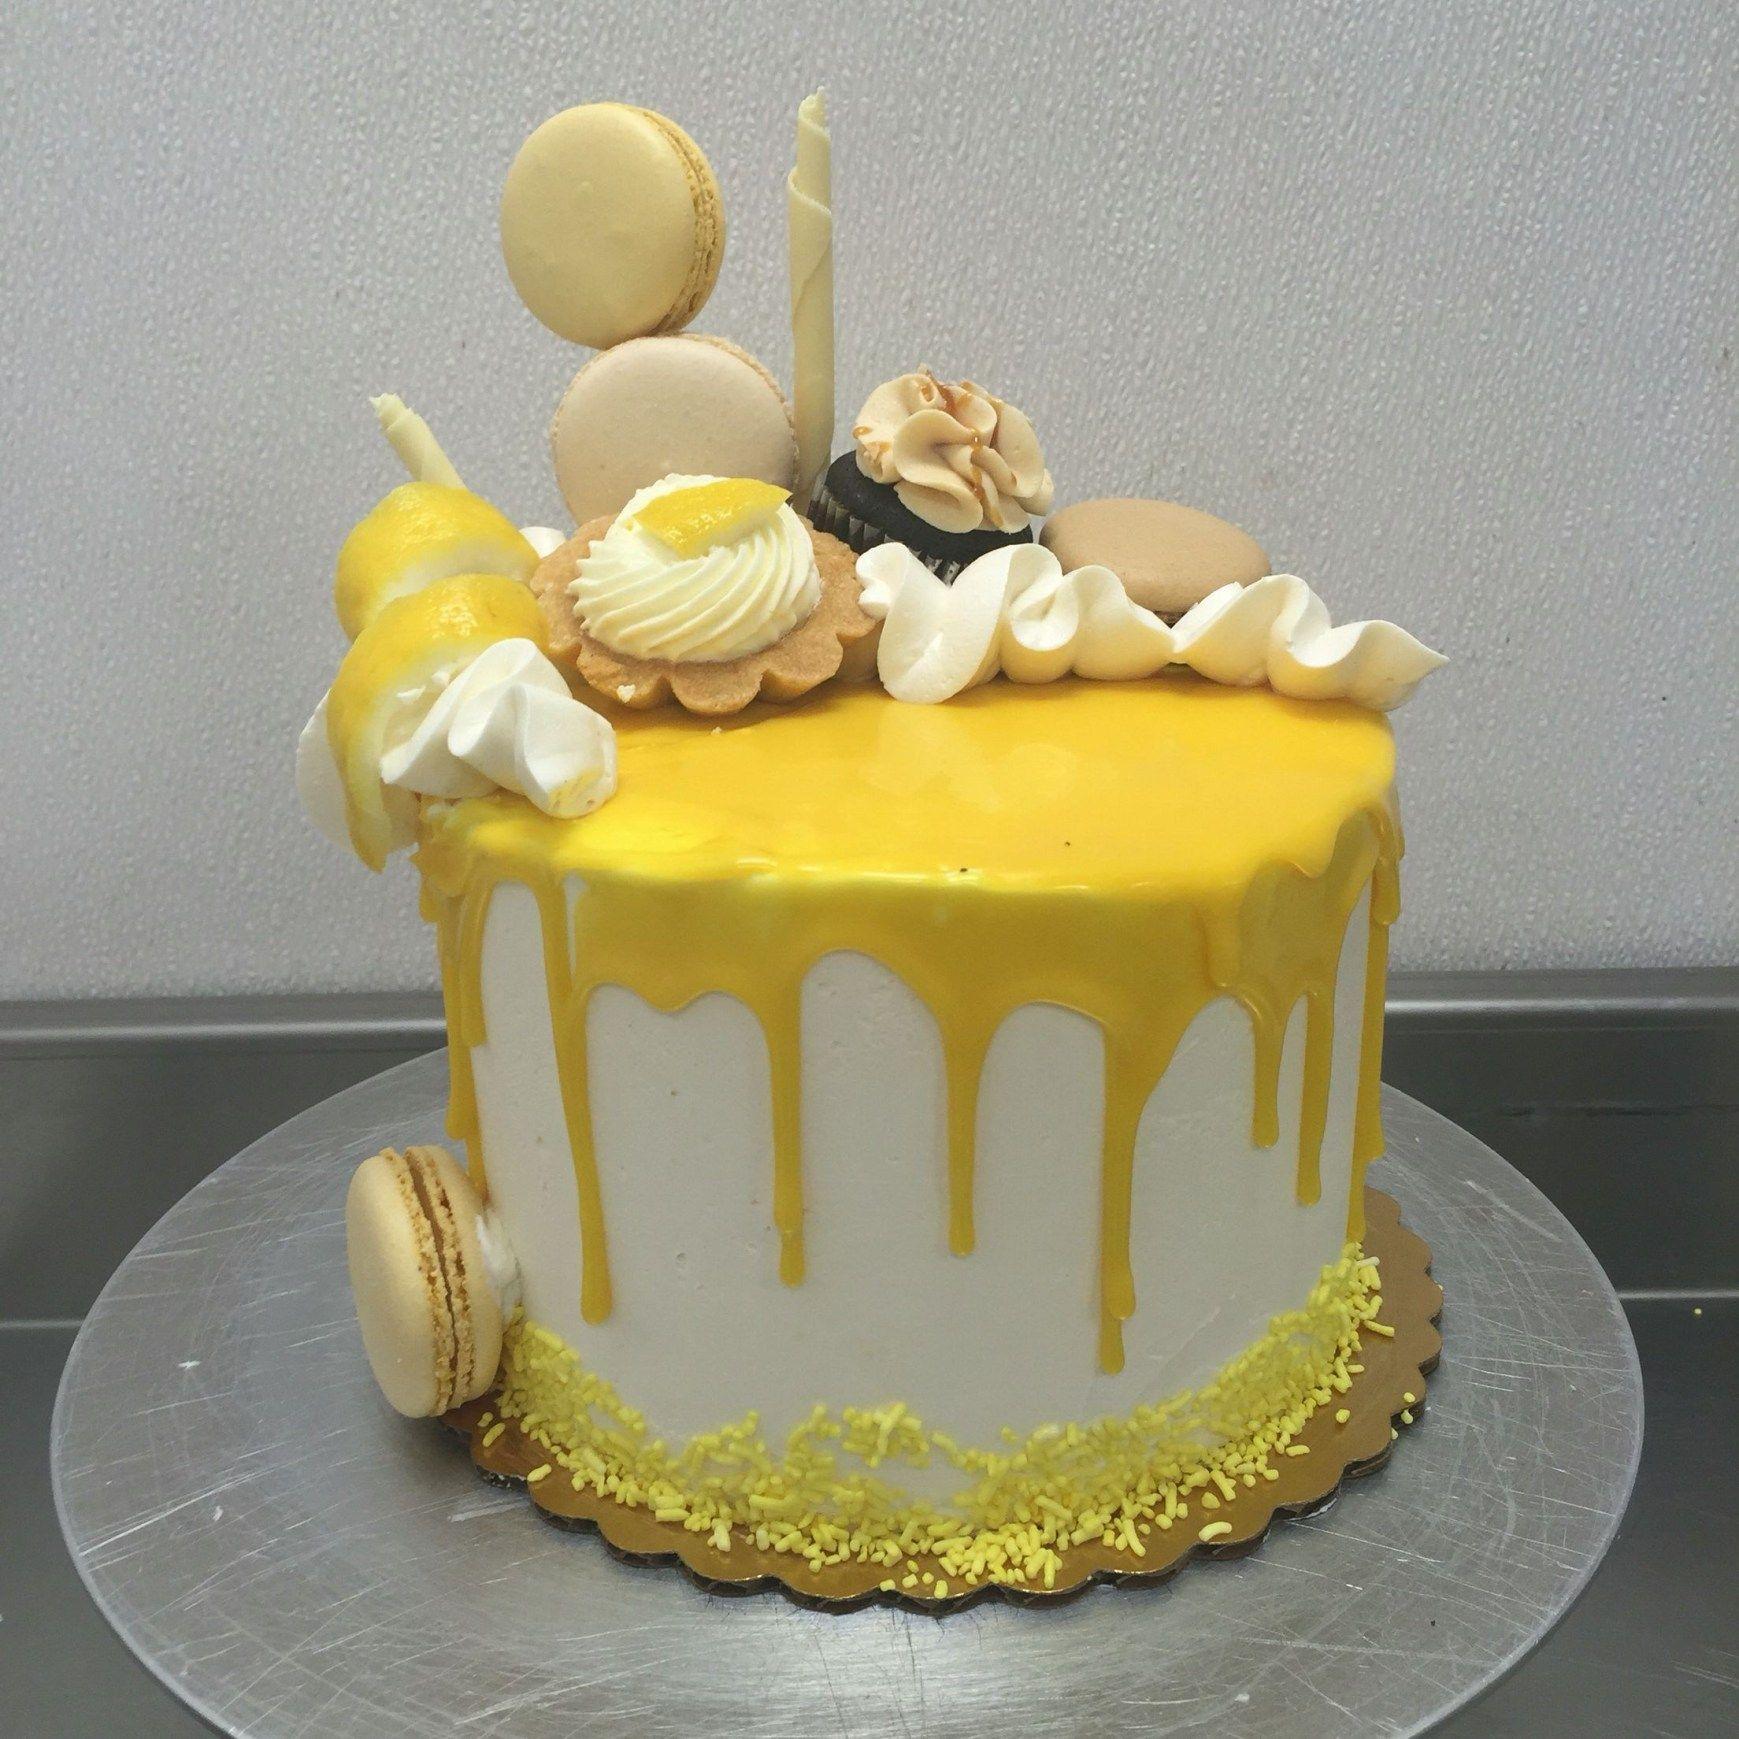 32 Amazing Picture Of Lemon Birthday Cake Lemon Birthday Cakes